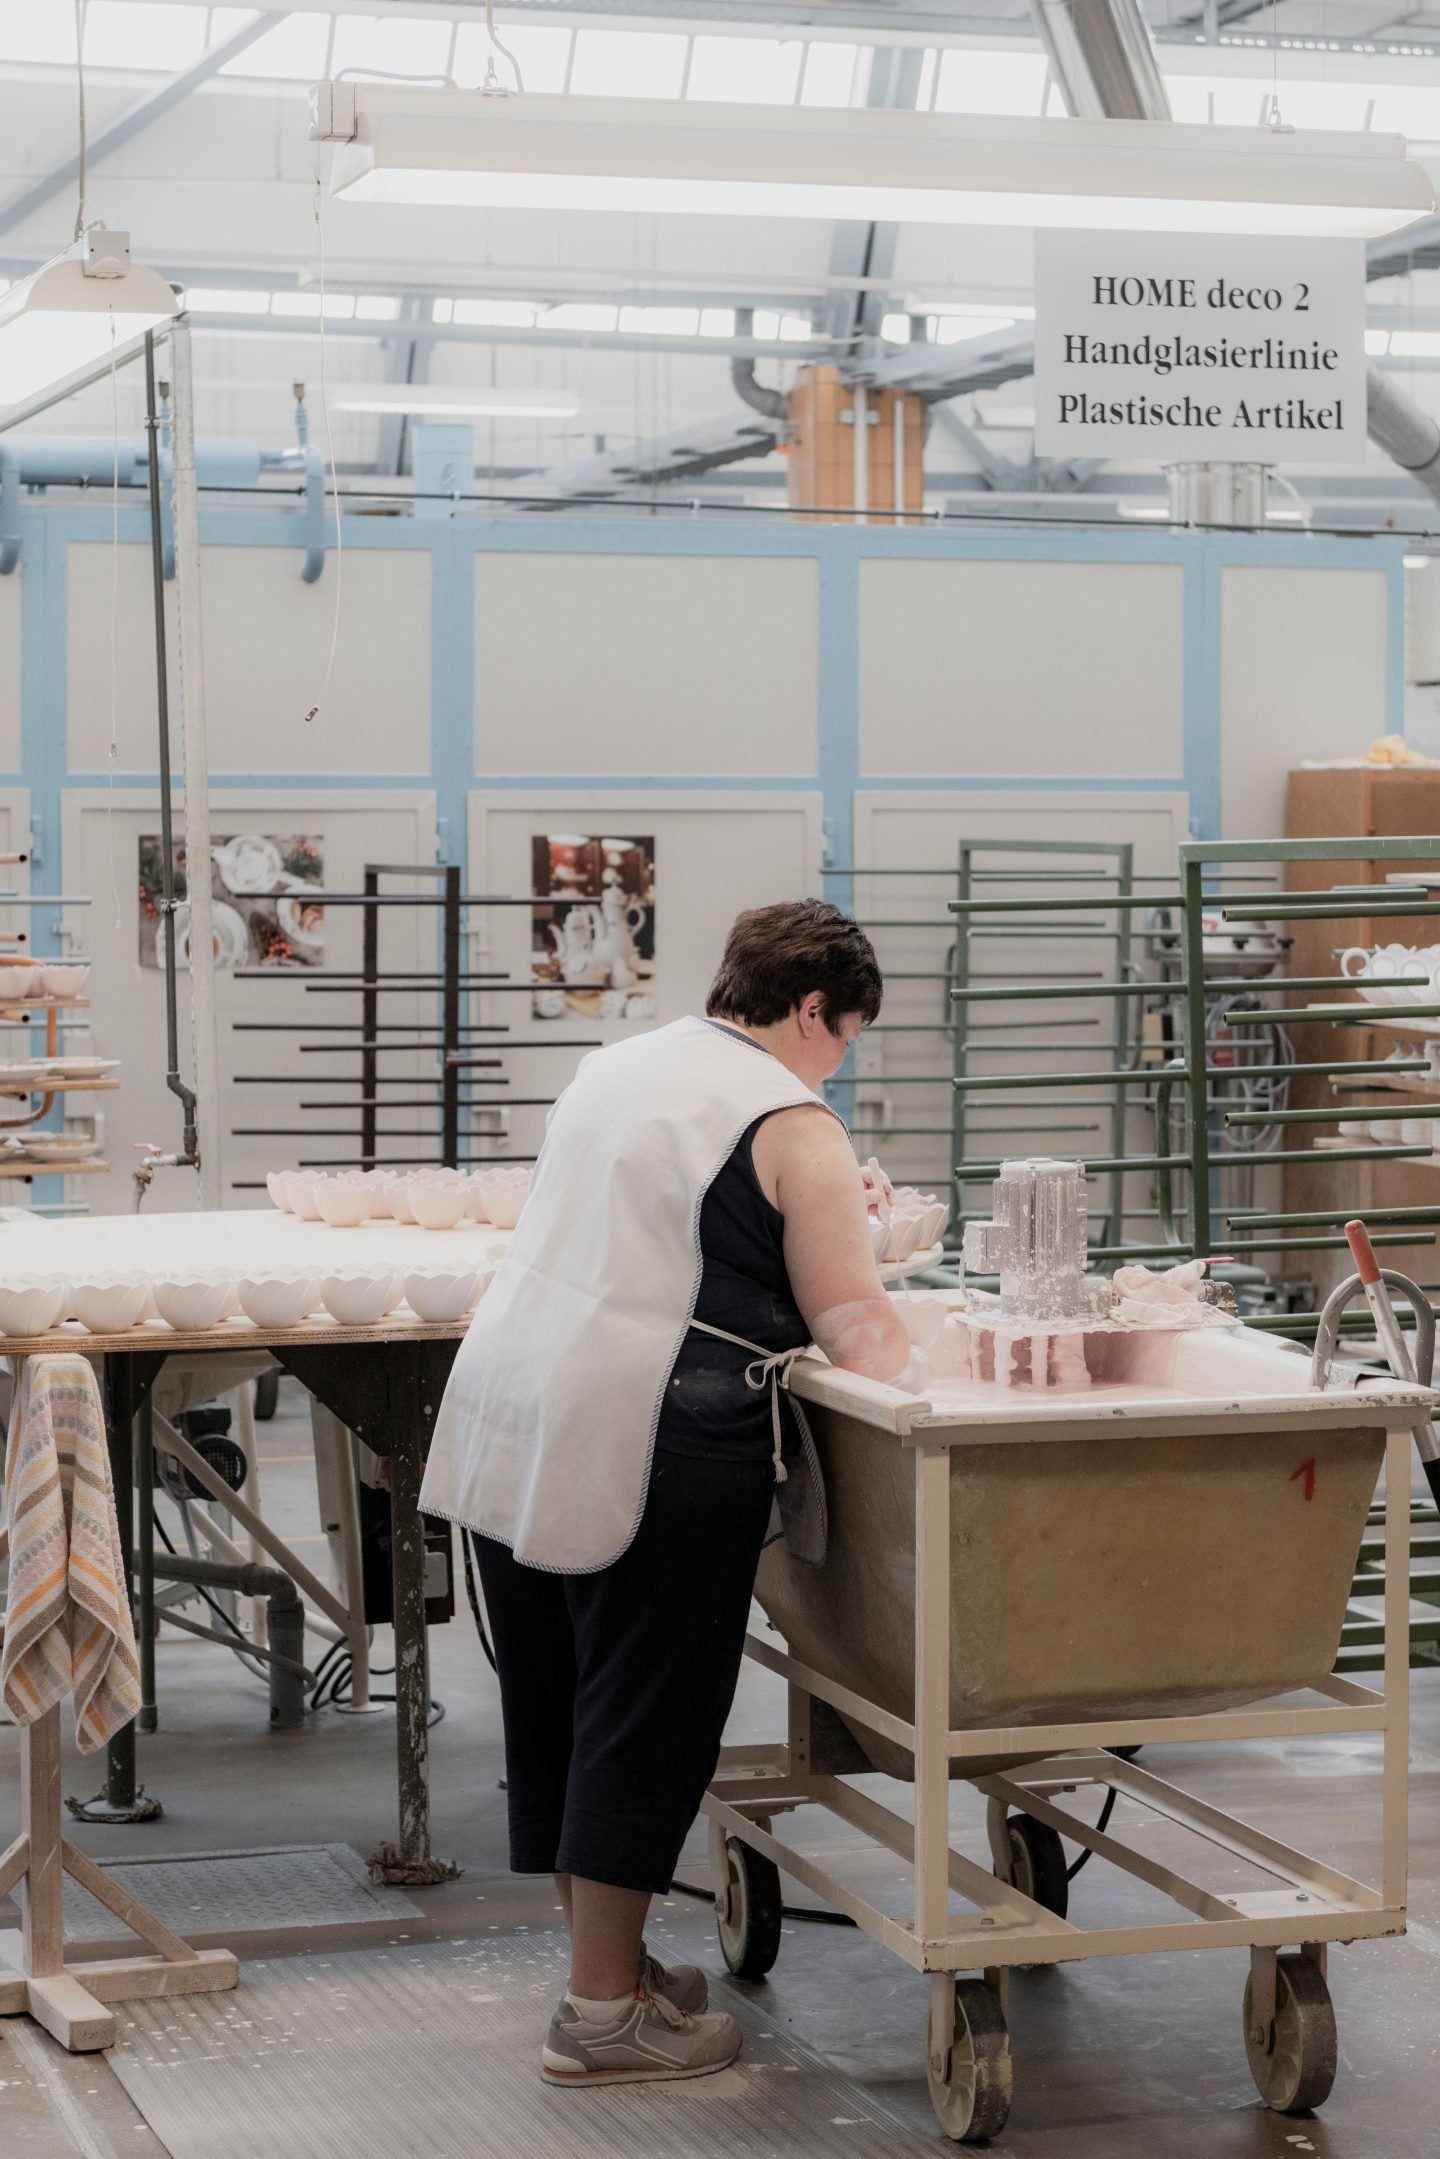 ignant-hugo-boss-meissen-factory-visit-franz-gruenewald-11